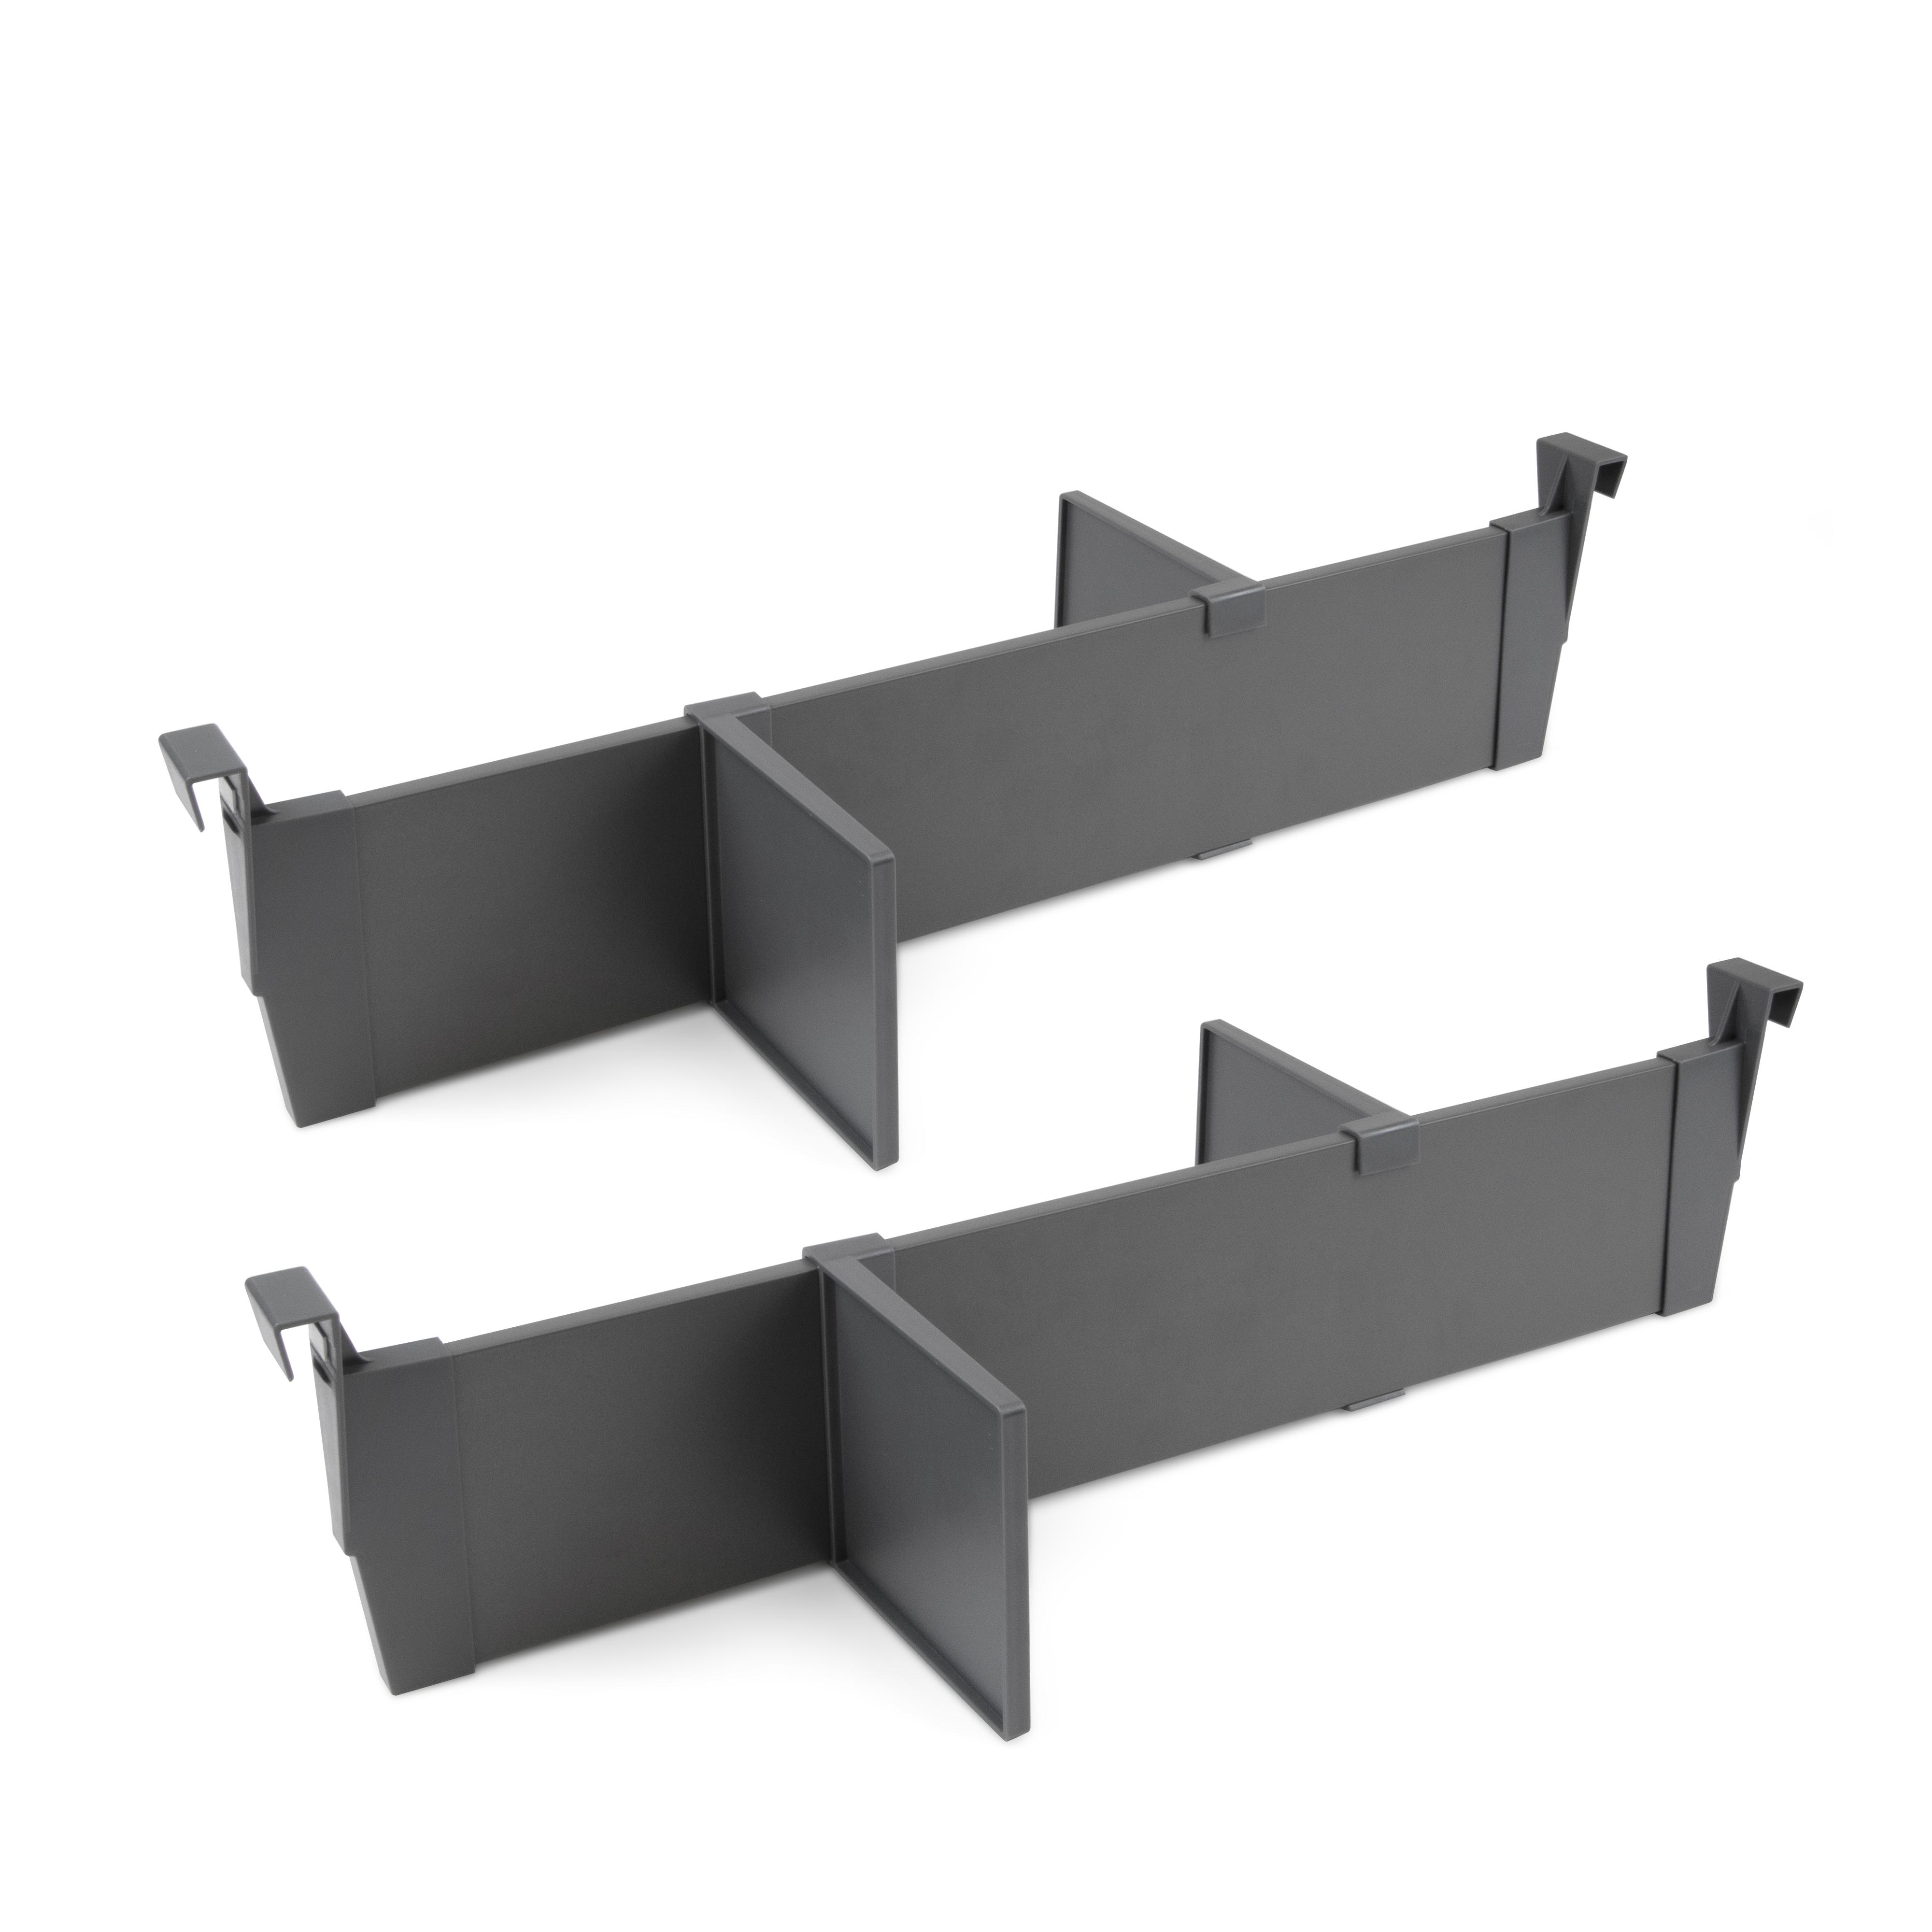 Emuca Set separatori regolabili per cassetti, accessori divisori organizer per cassetti 600mm, alluminio, grigio antracite